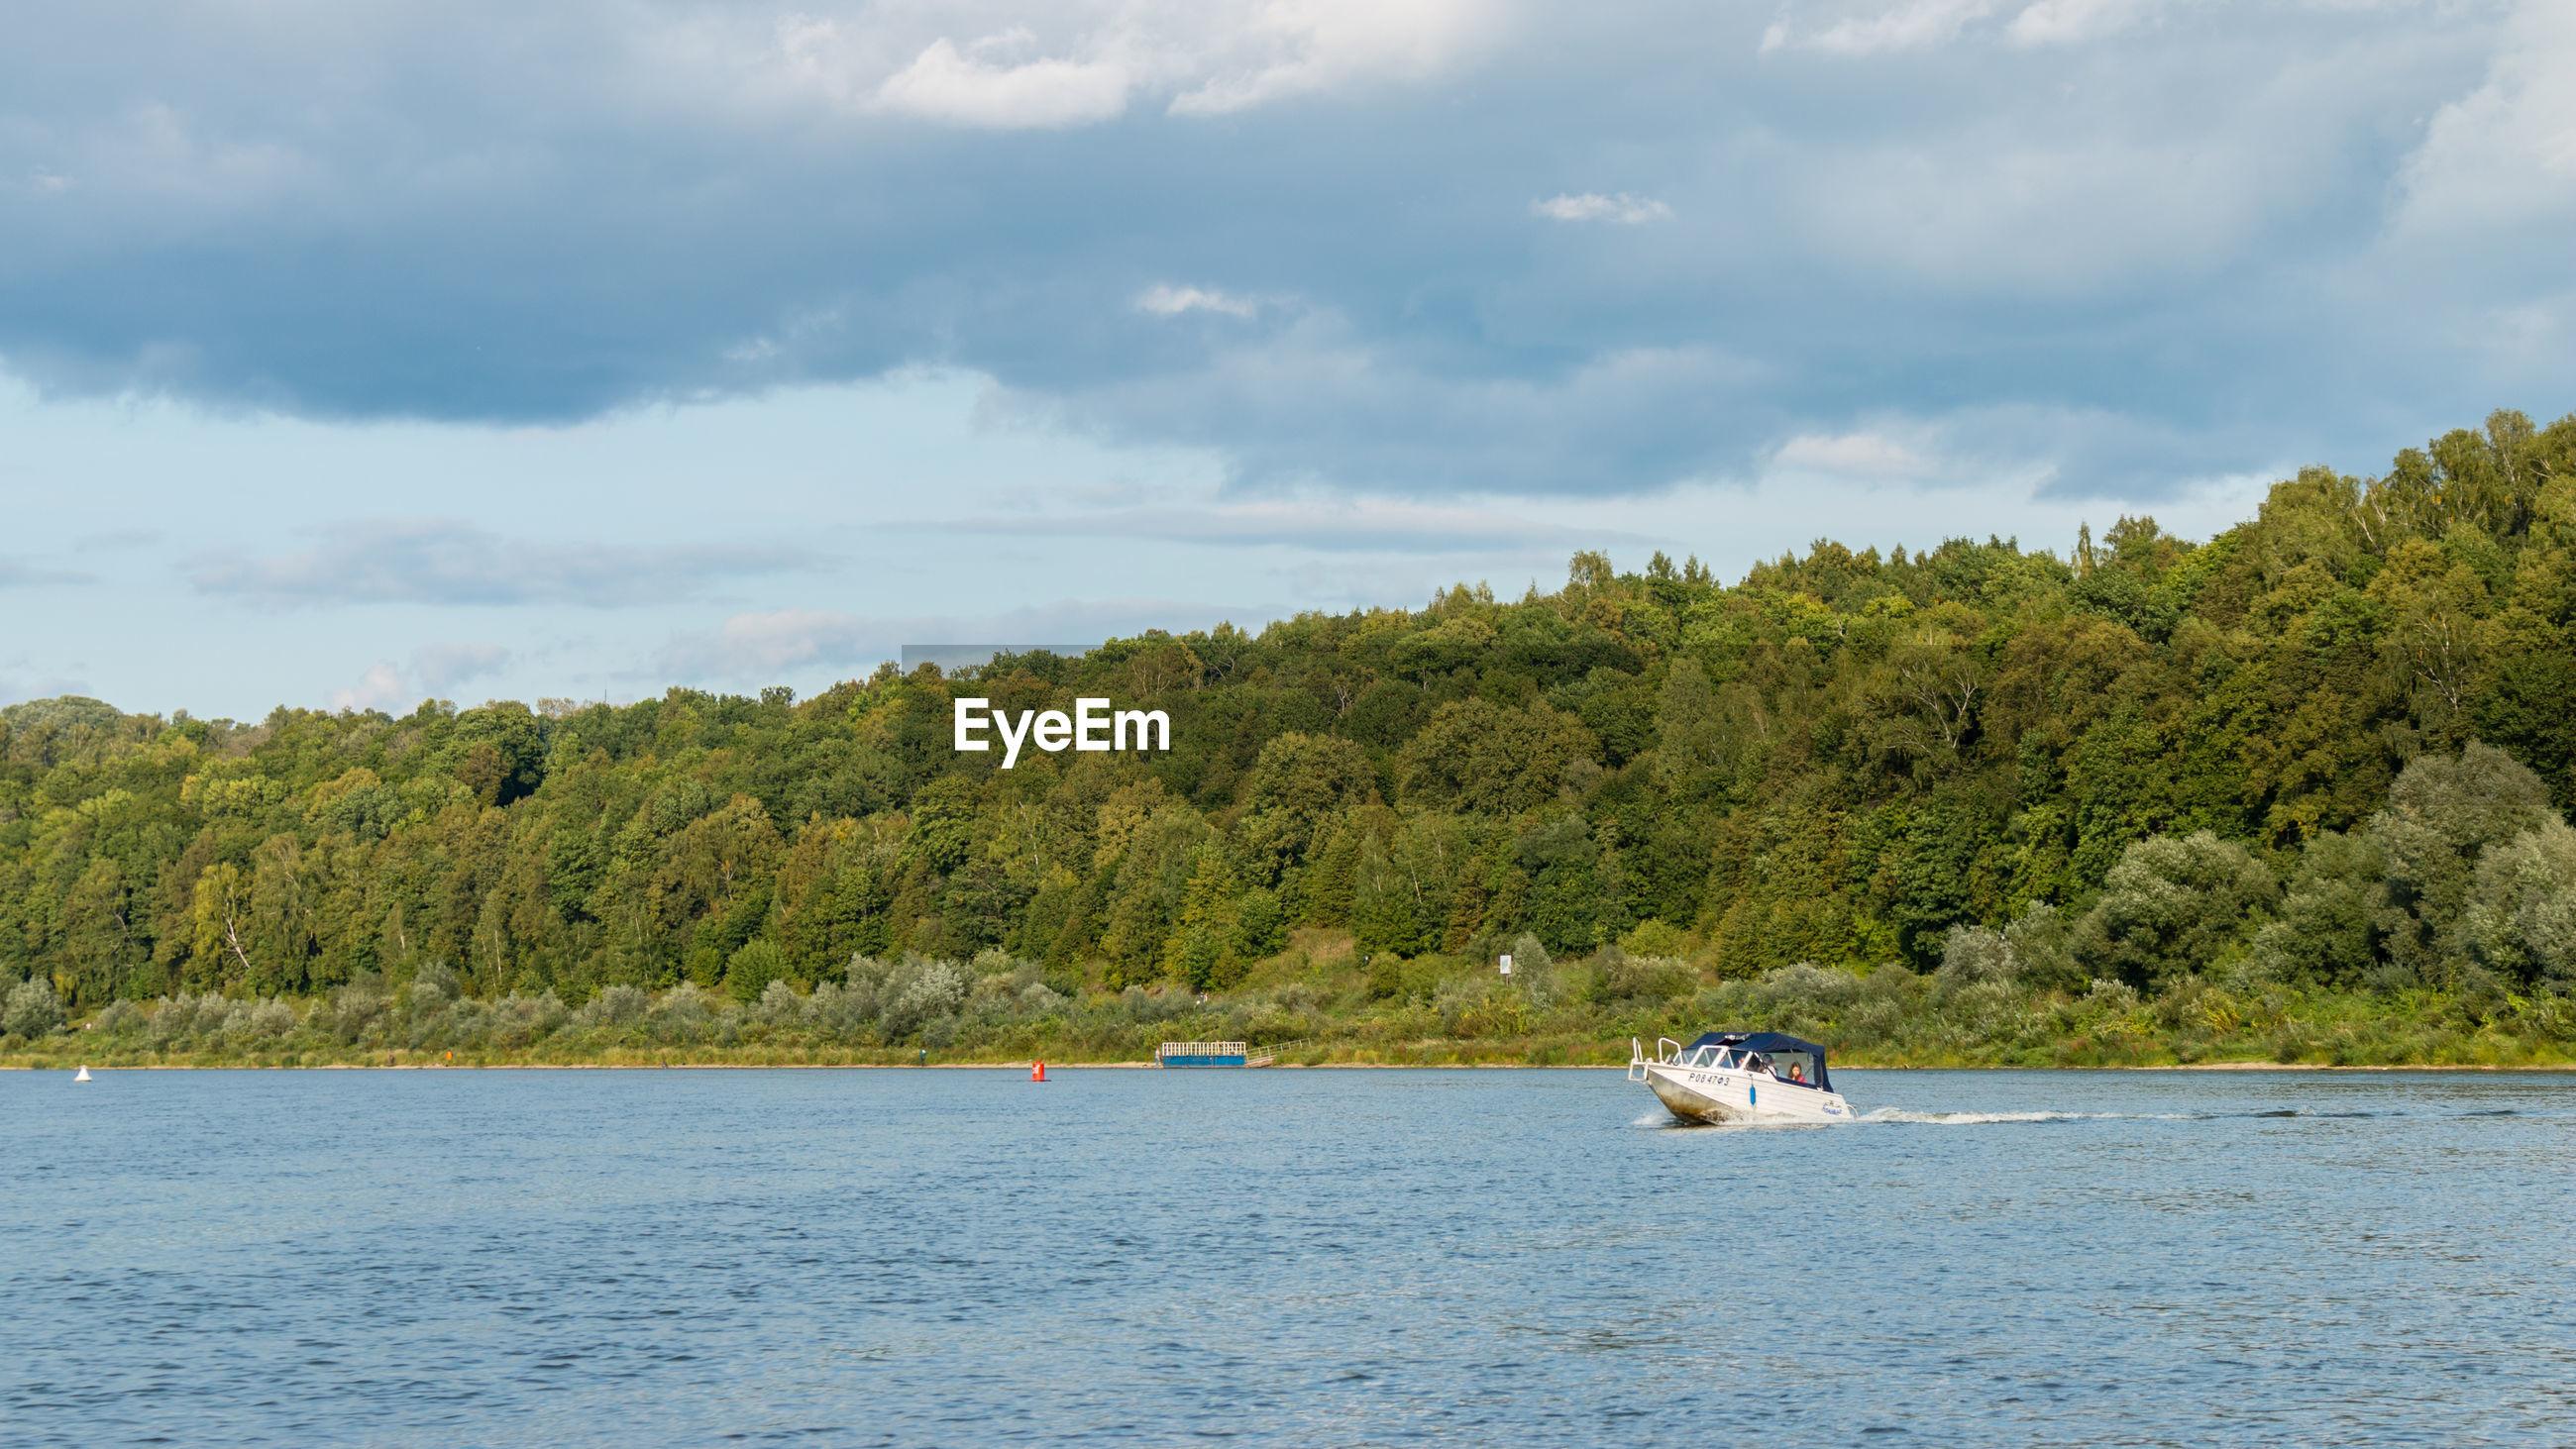 Boat on the oka river, russia, polenovo